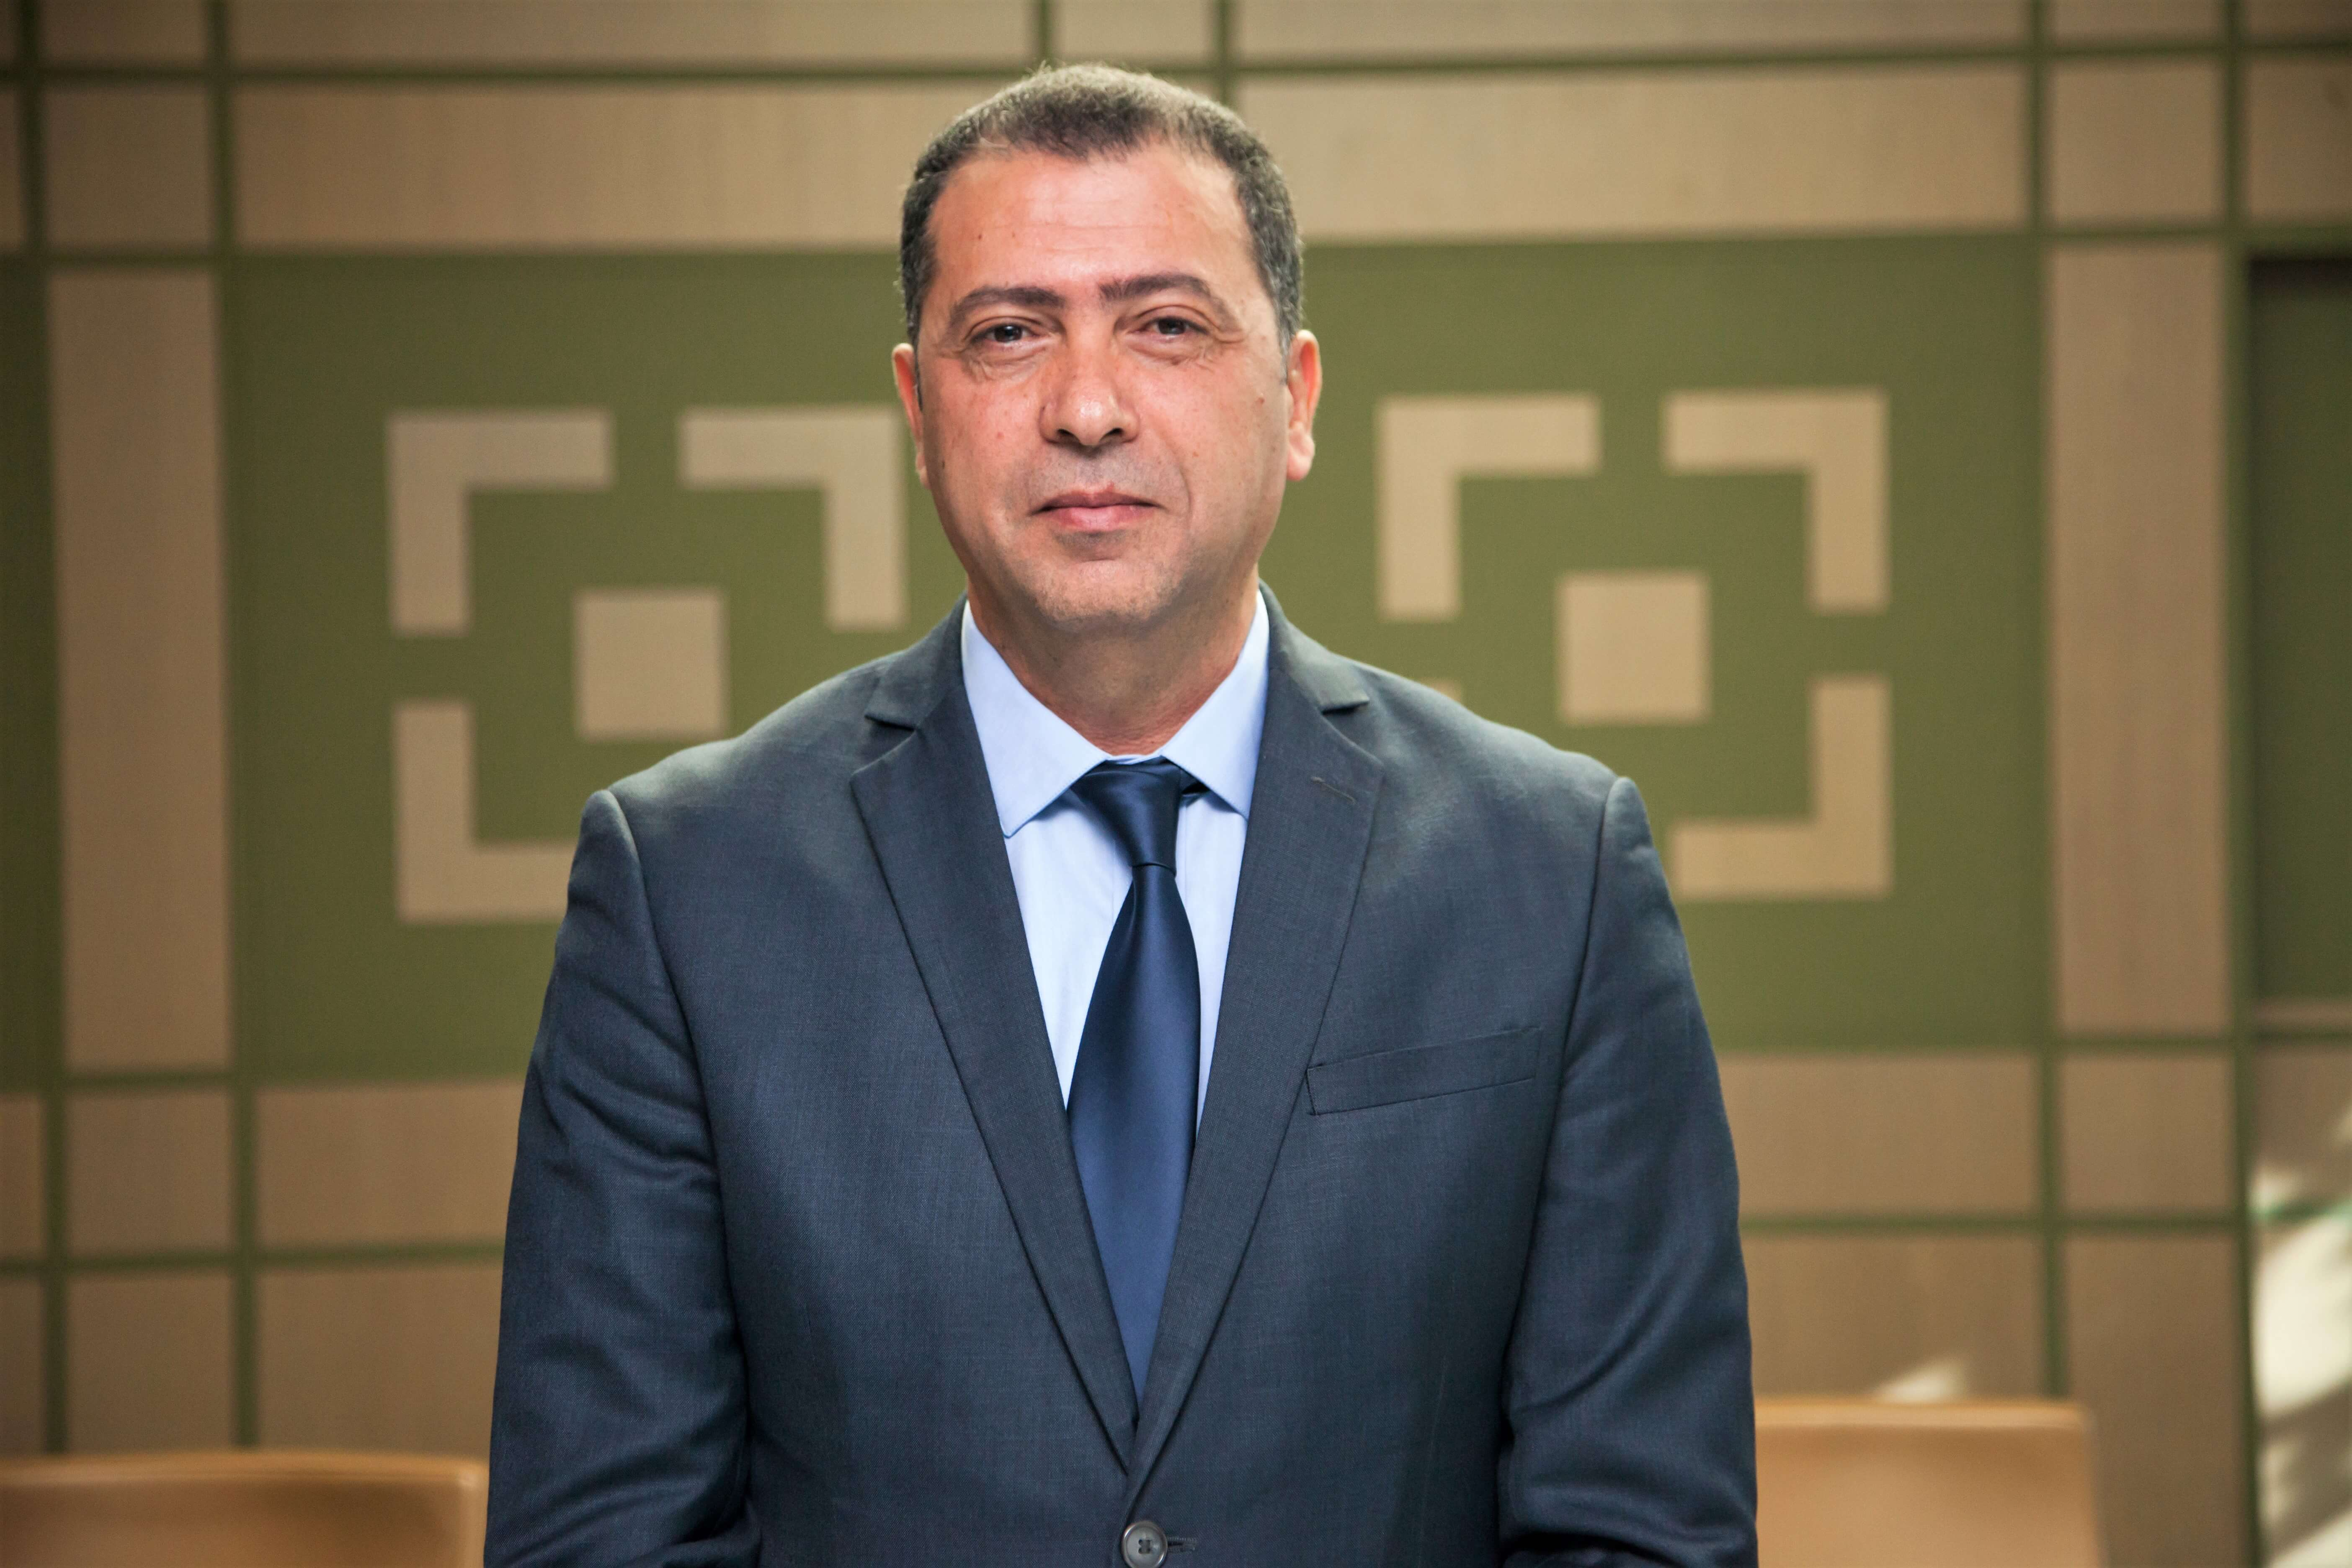 Mr. Adel ALAYA